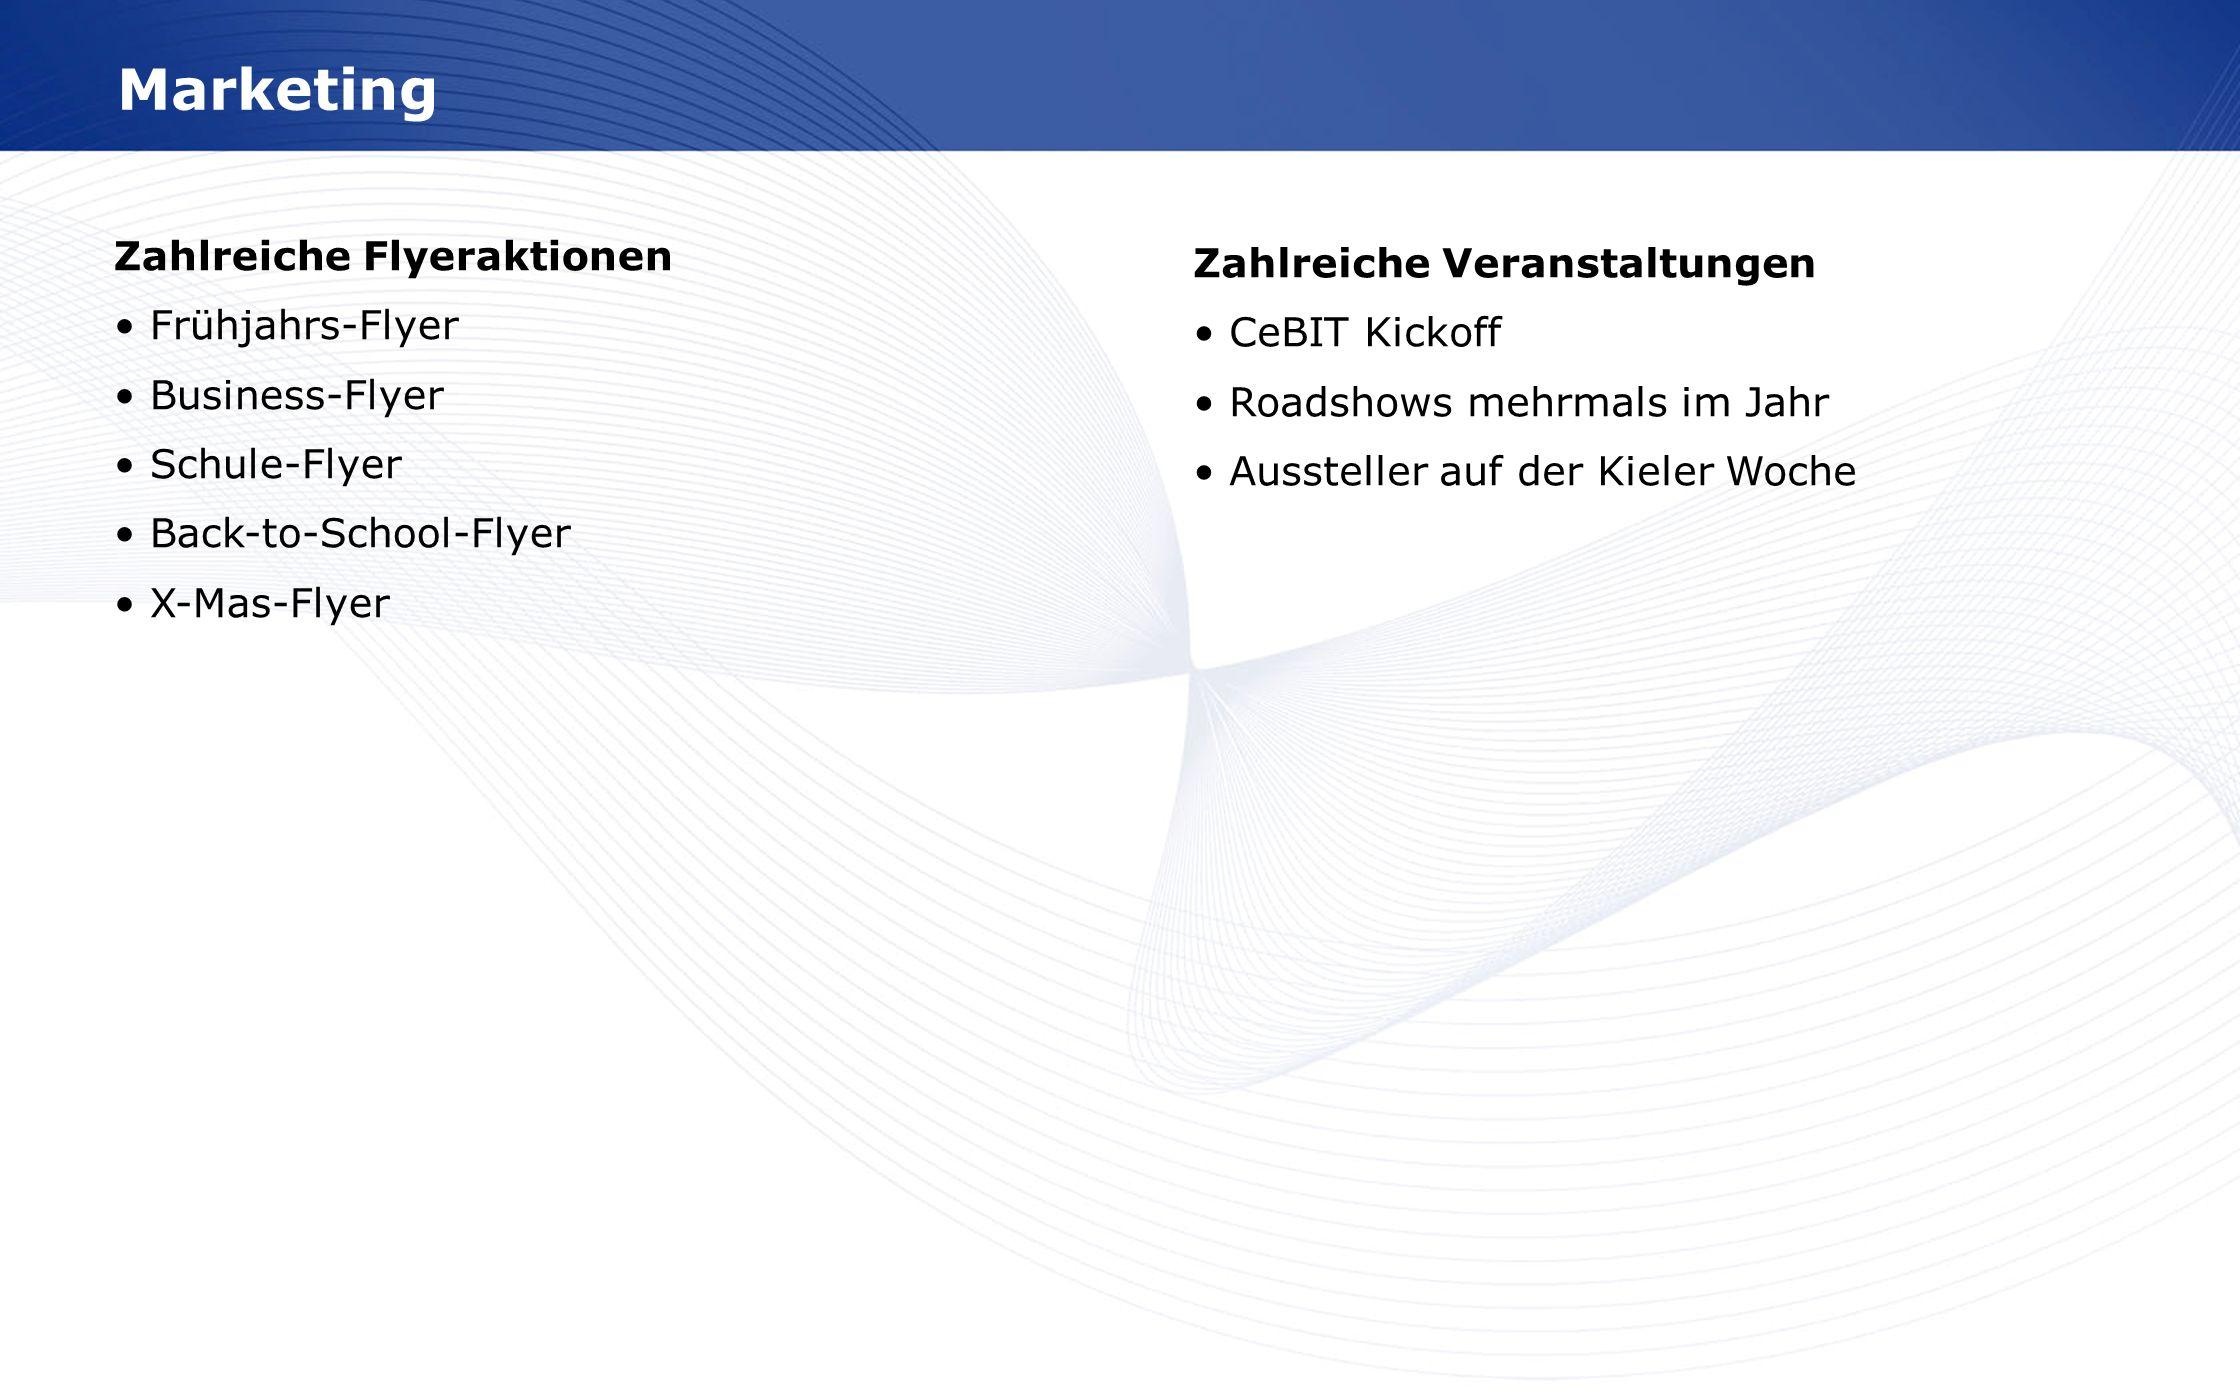 MarketingZahlreiche Flyeraktionen • Frühjahrs-Flyer • Business-Flyer • Schule-Flyer • Back-to-School-Flyer • X-Mas-Flyer.